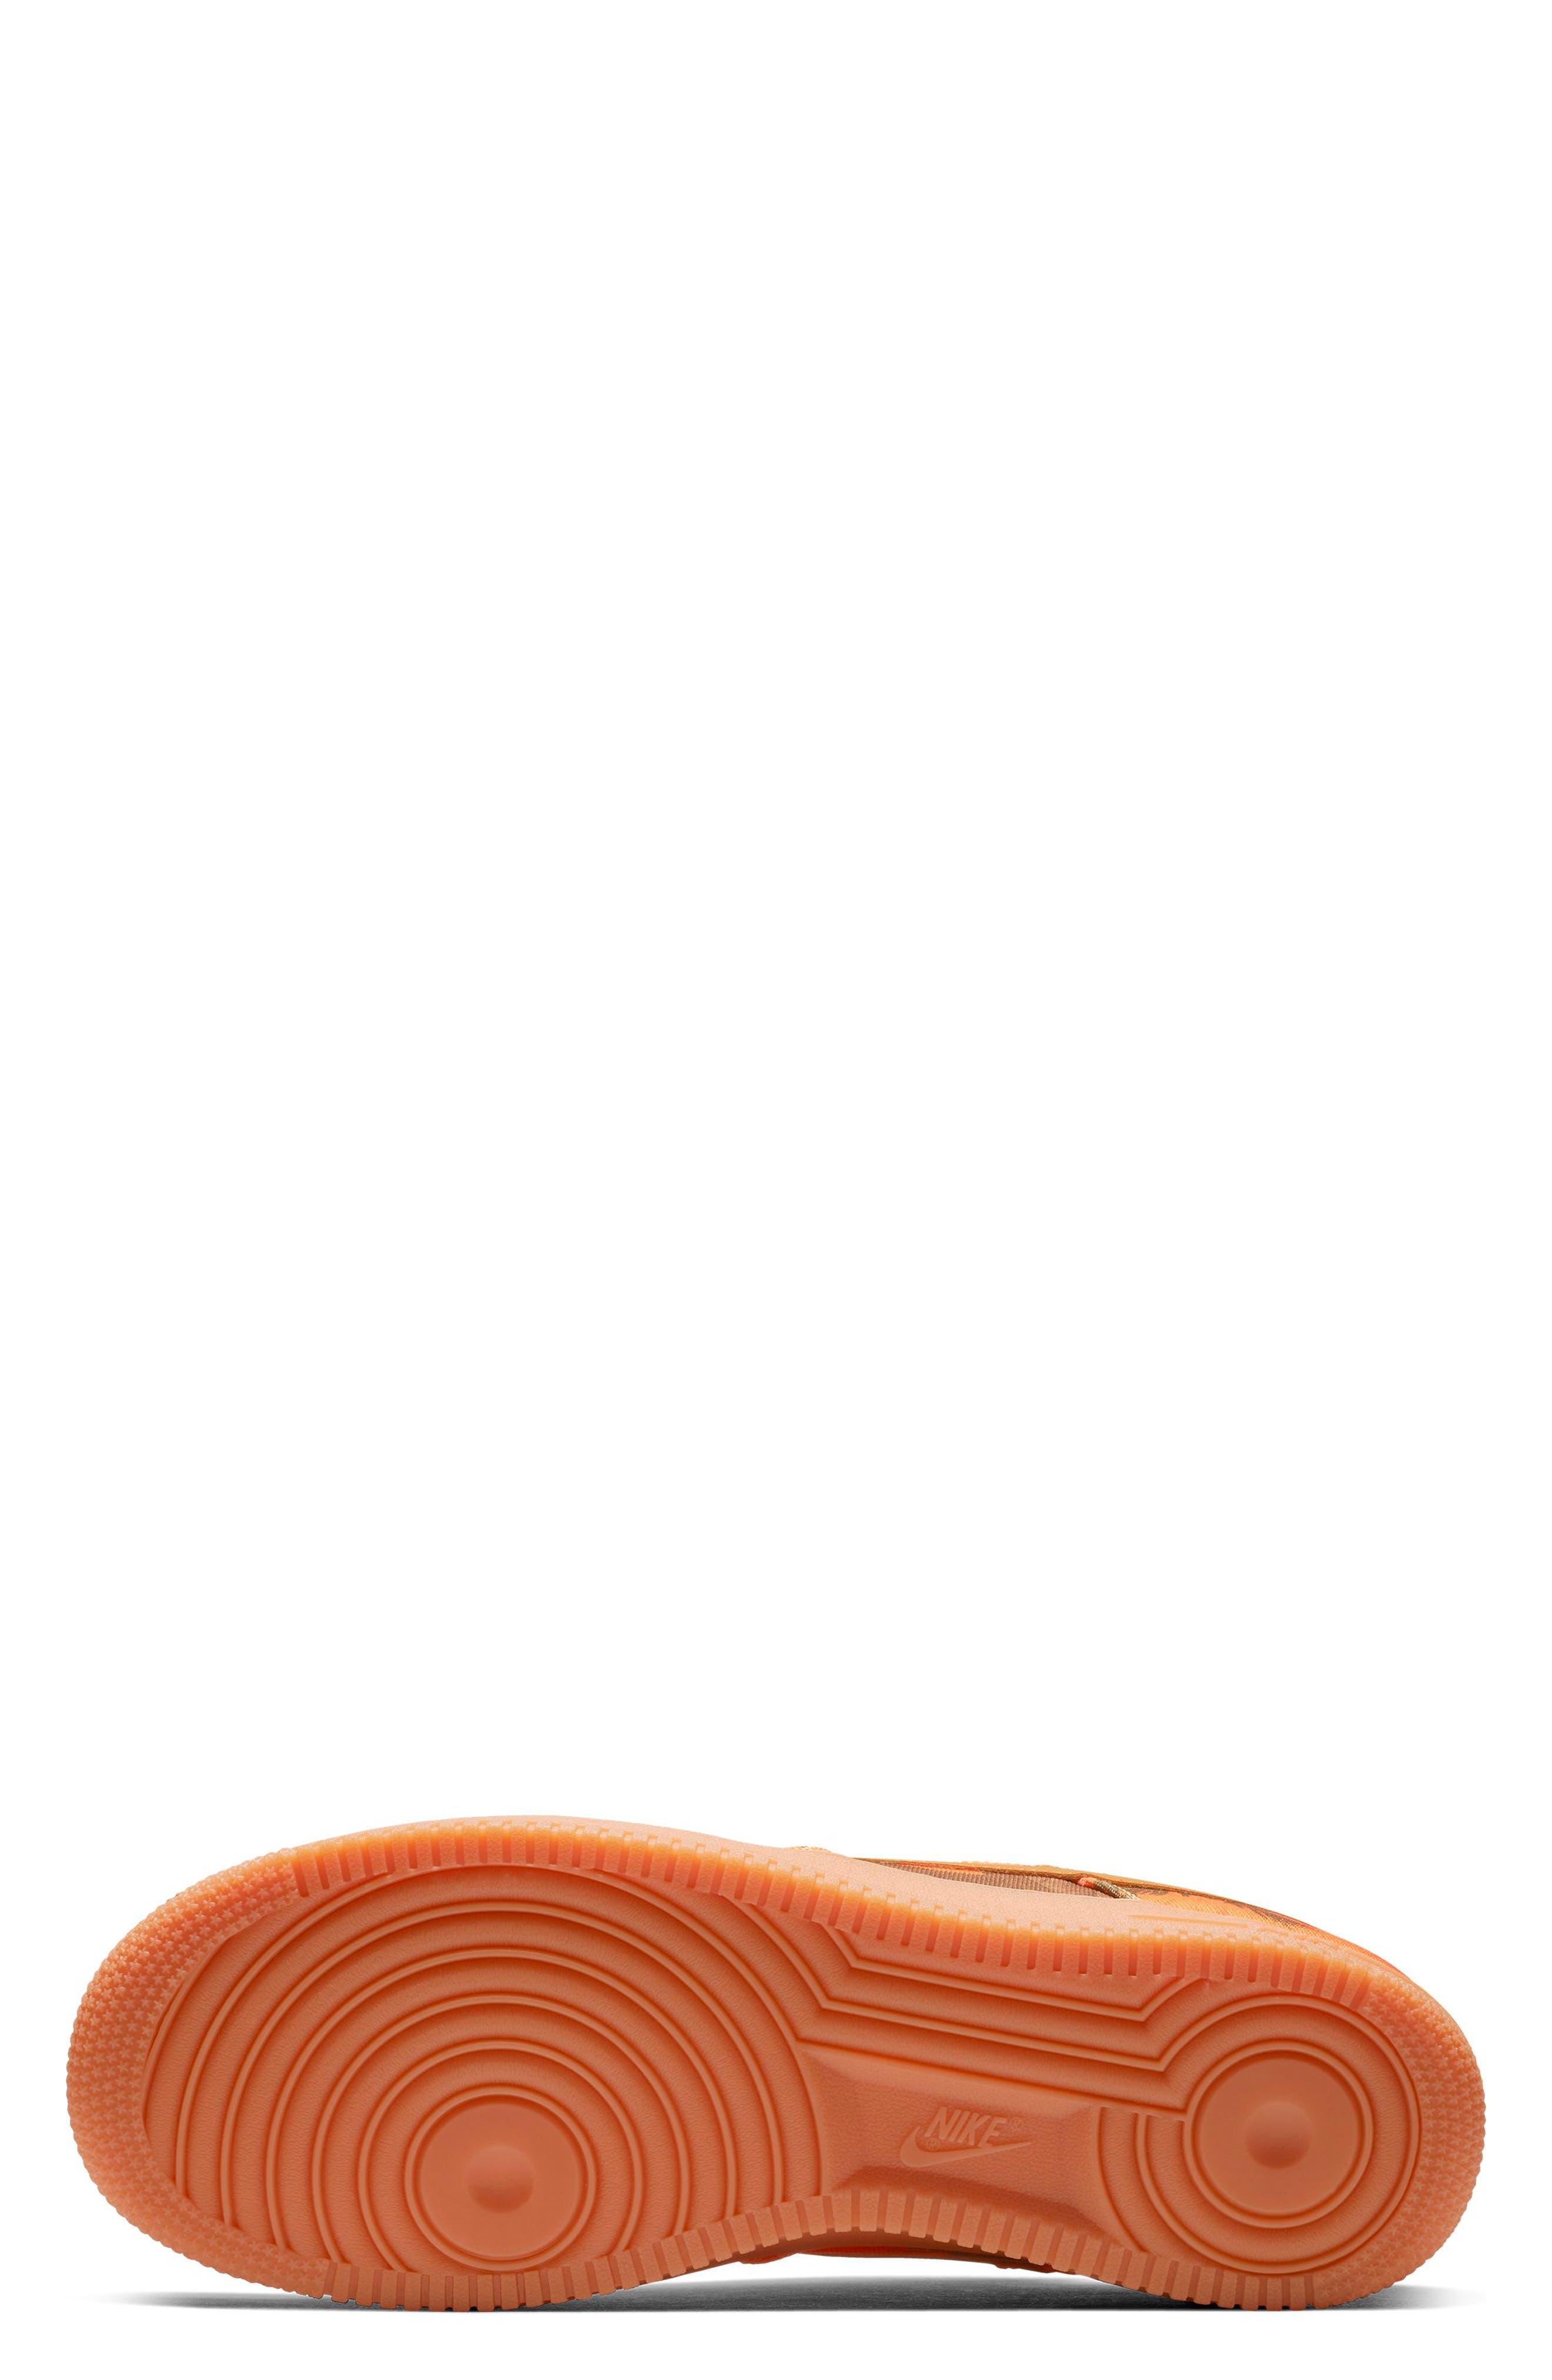 NIKE,                             Air Force 1 '07 LV8 3 Sneaker,                             Alternate thumbnail 5, color,                             ORANGE BLAZE/ WHITE/ BROWN